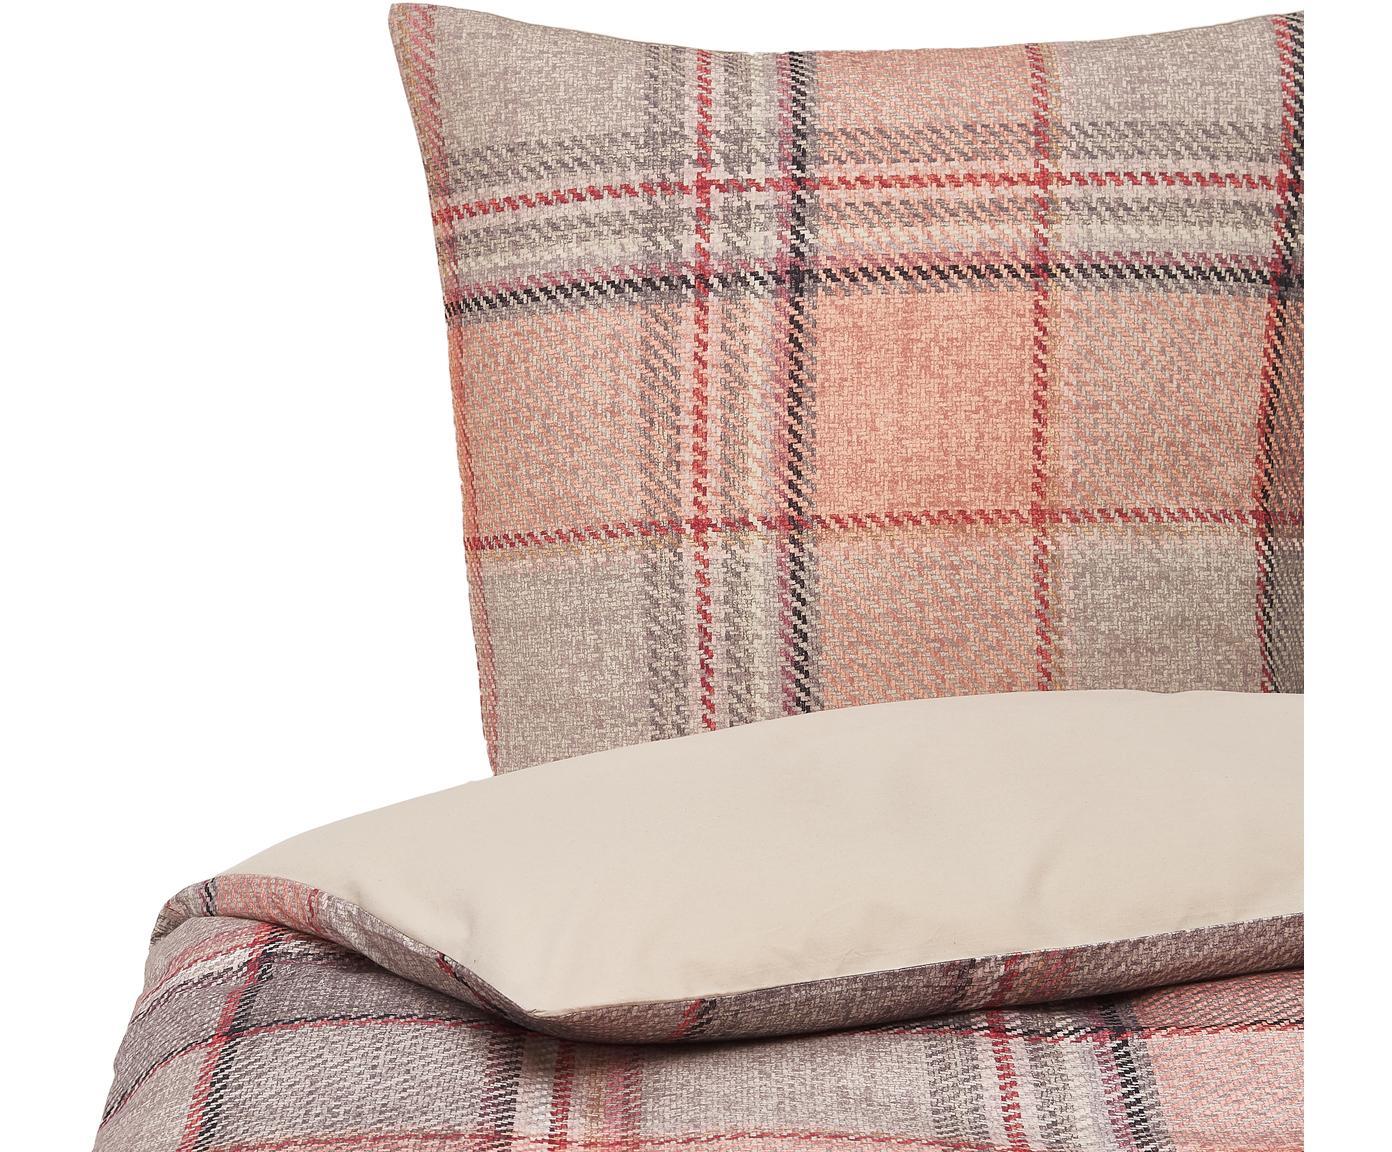 Flanell-Bettwäsche Beau in Rosa, Webart: Flanell Fadendichte 144 T, Creme, Grau, Rosa, 135 x 200 cm + 1 Kissen 80 x 80 cm